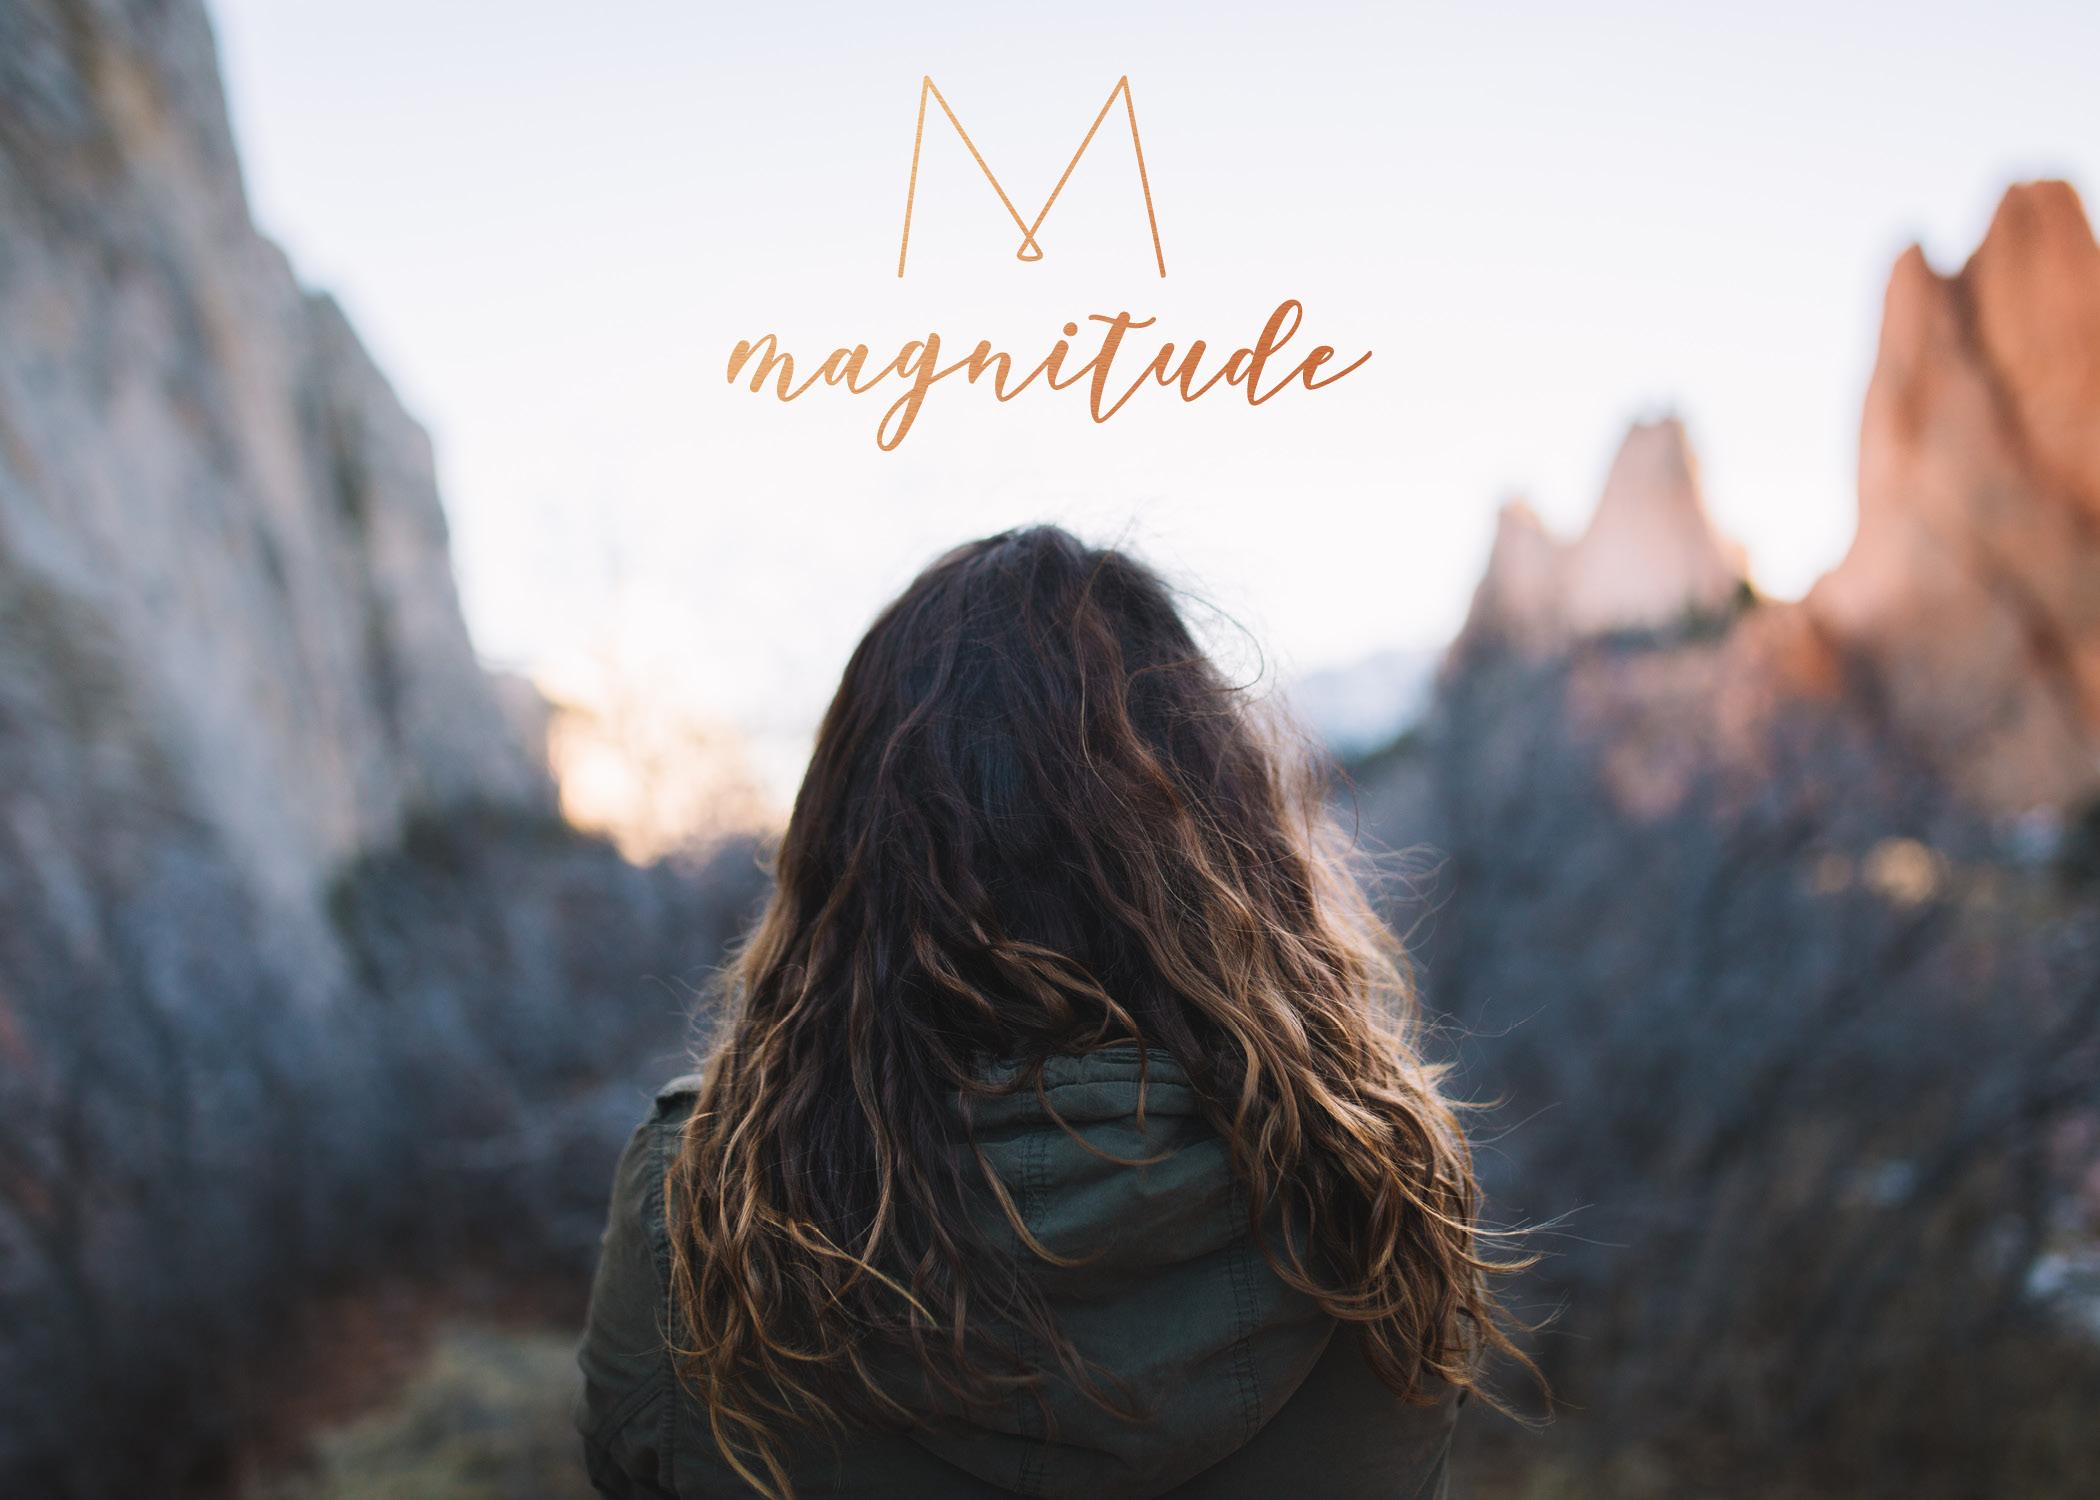 Magnitude_Images3.jpg